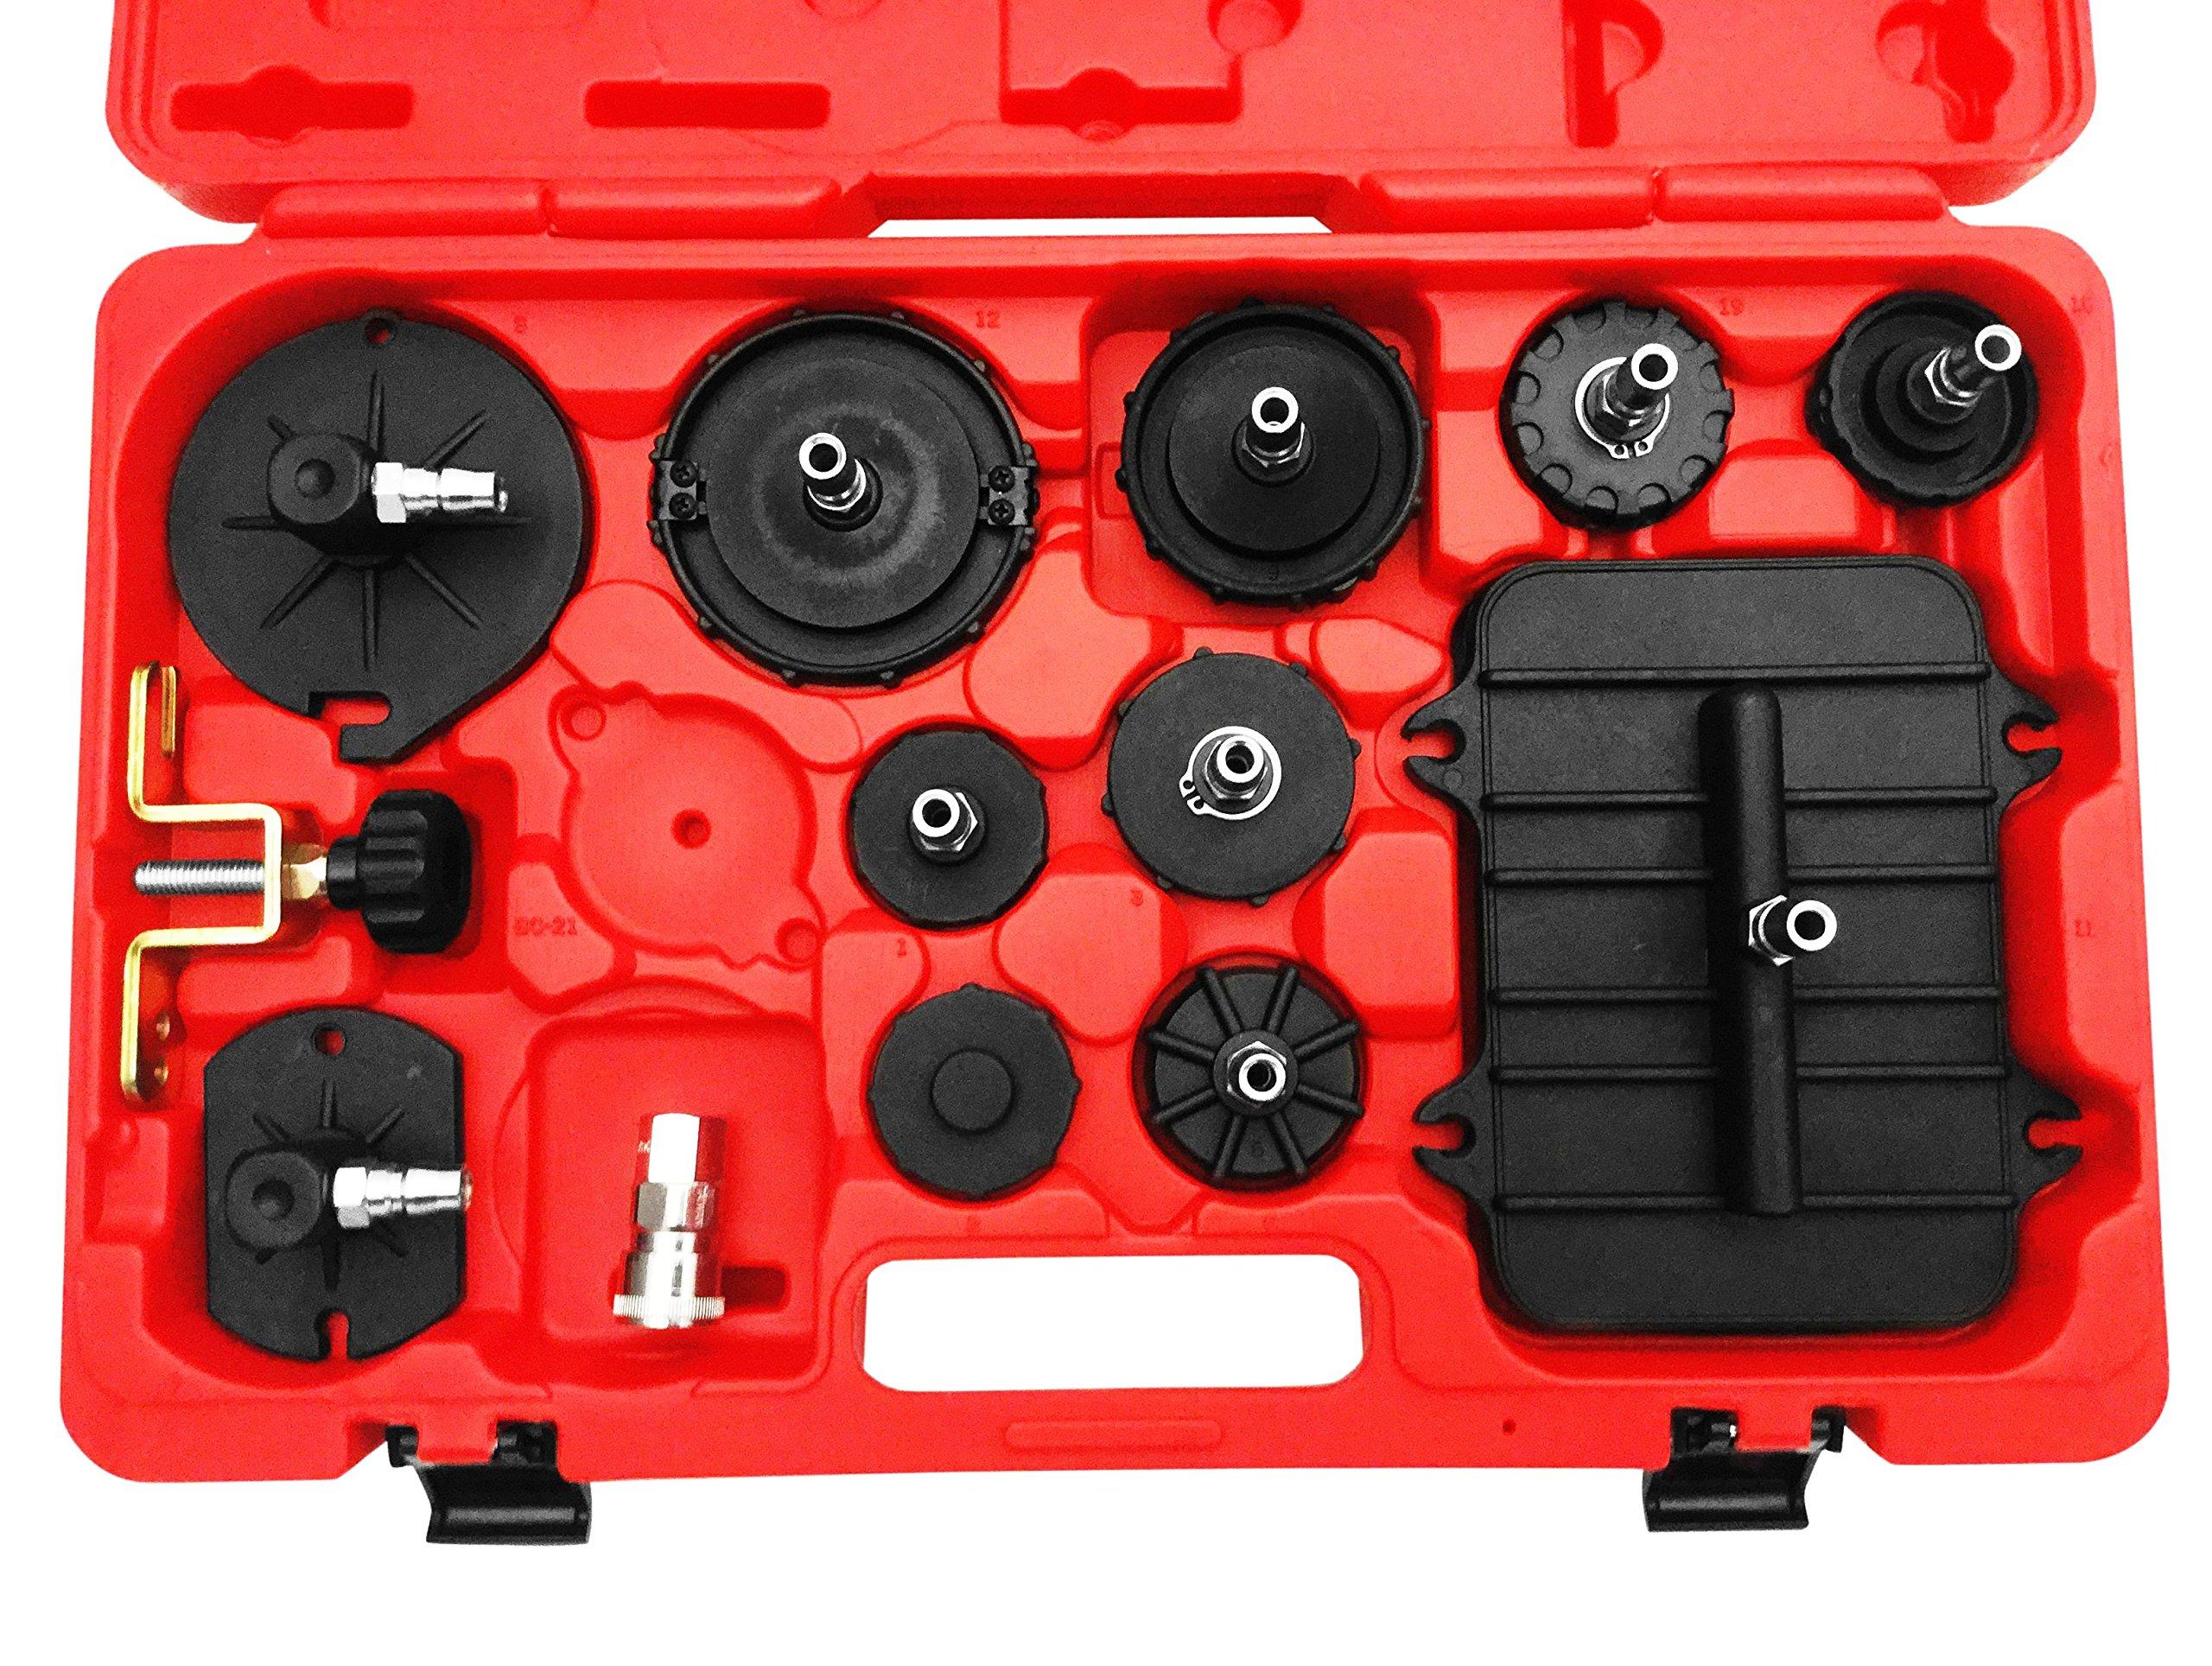 CTA Tools 7300 Brake Bleeder Adapter kit by CTA Tools (Image #1)